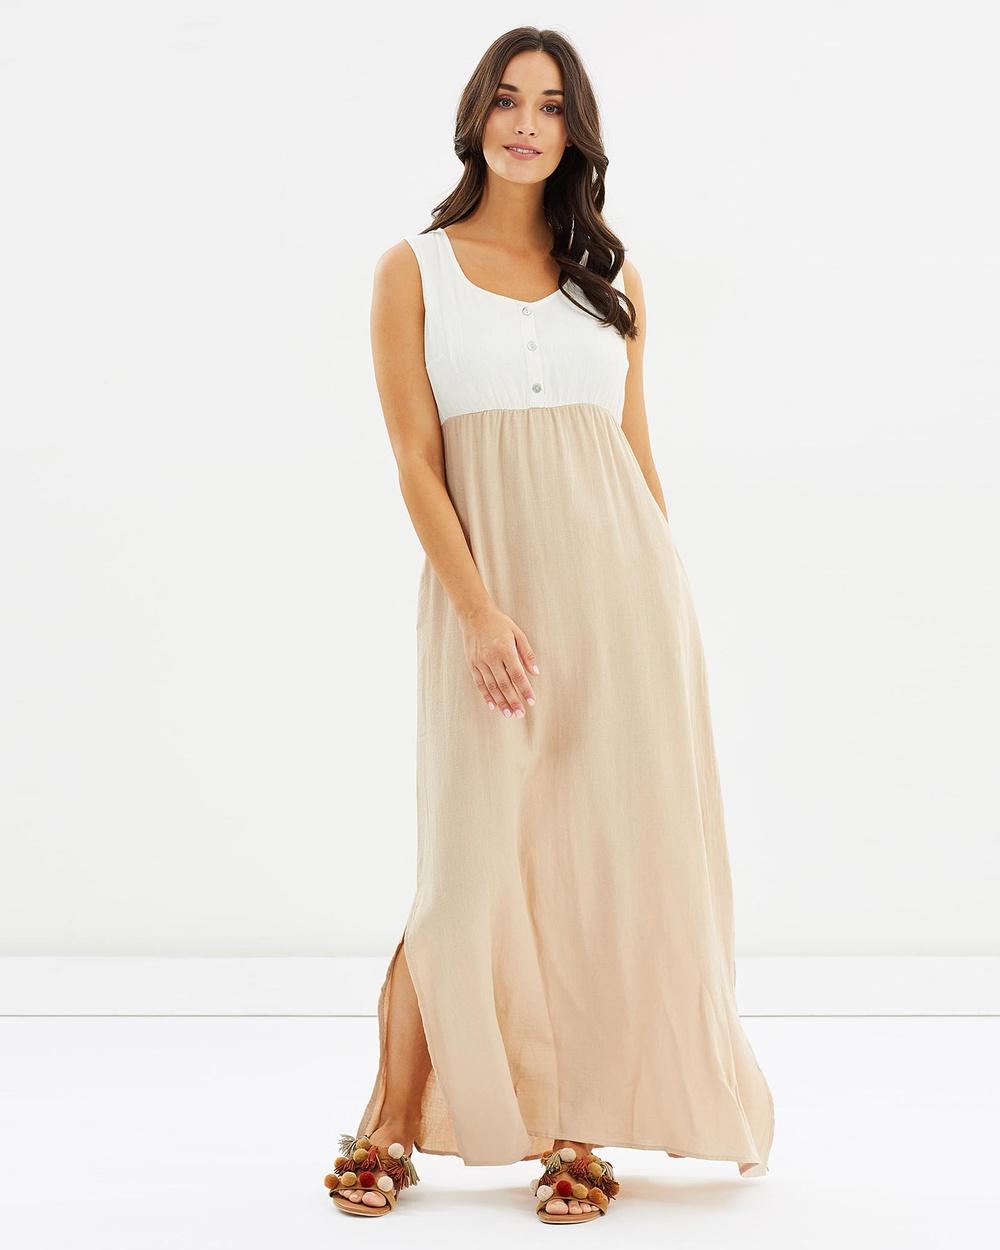 Kaja Clothing Cecilie Dress Dresses White & Camomile Cecilie Dress